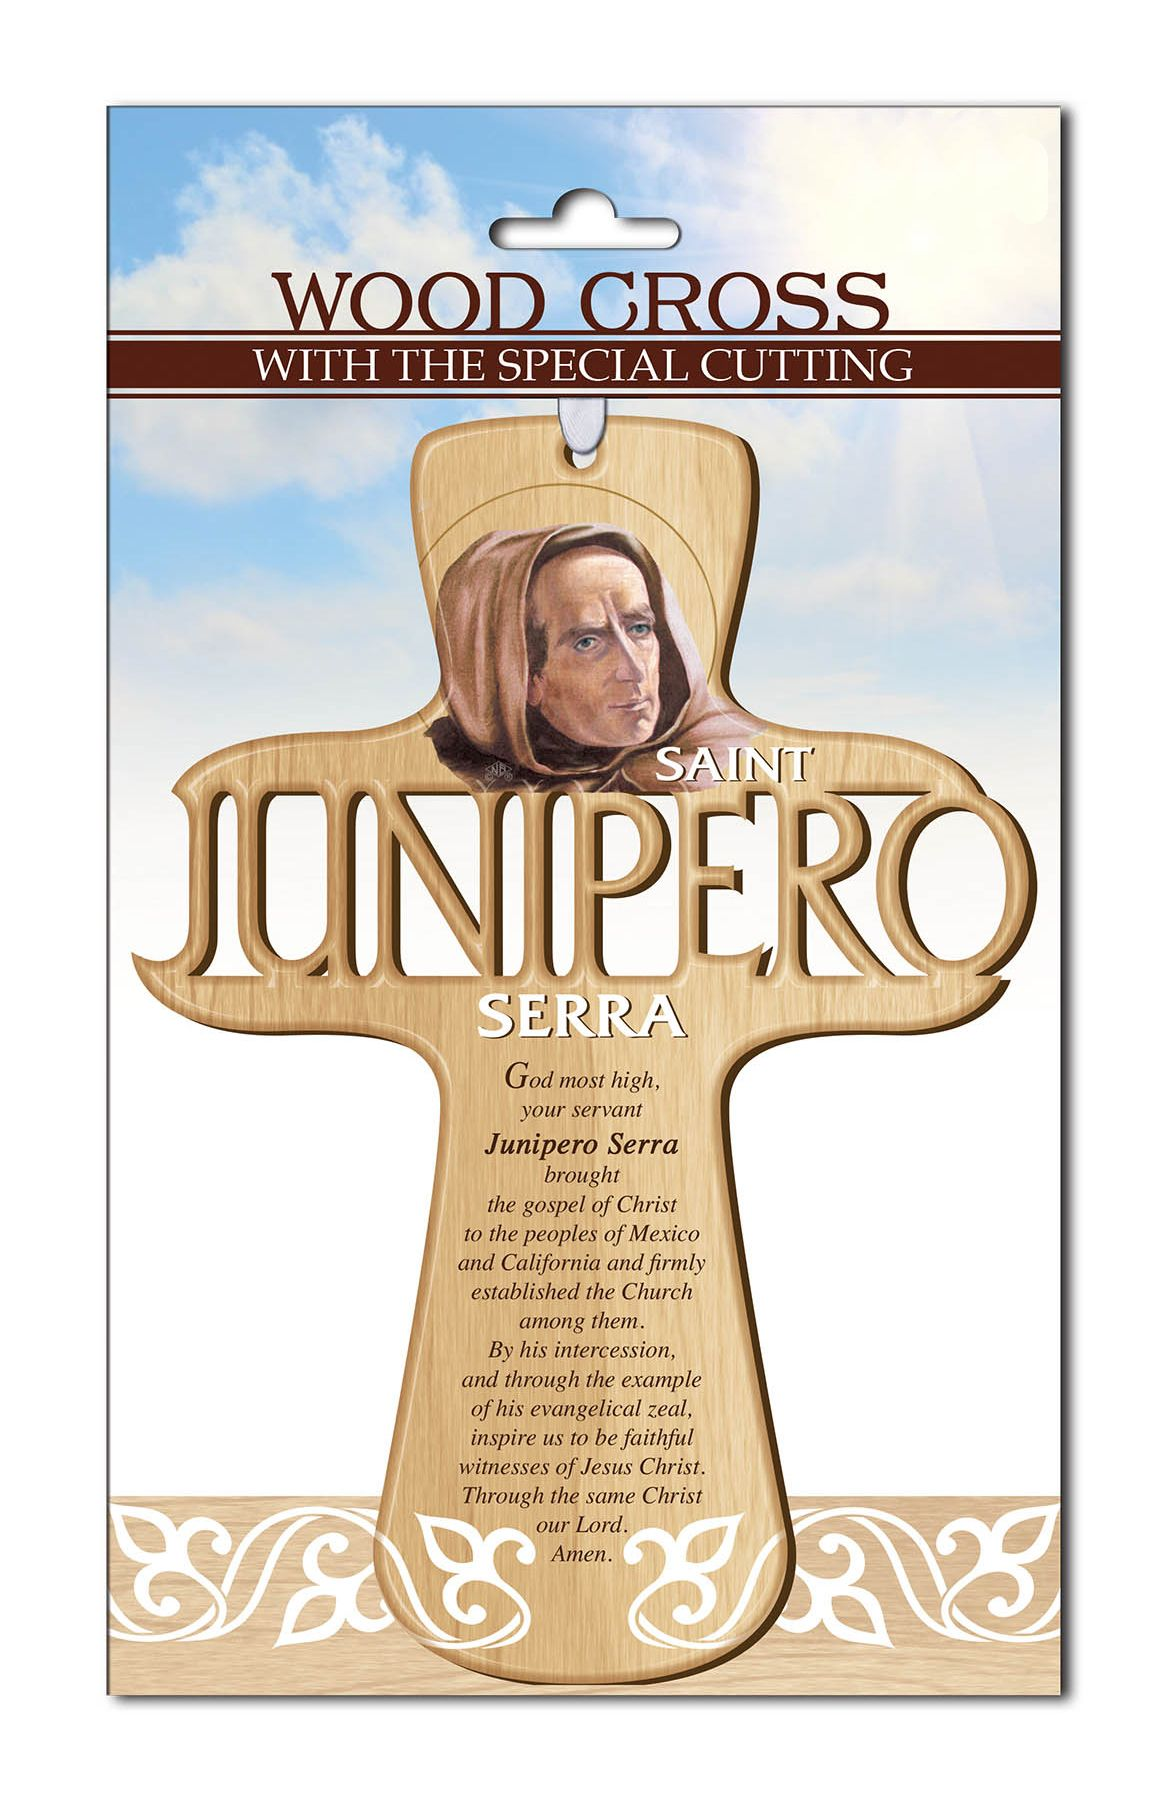 Saint Junipero Serra Carved Wall Cross mexican saint, junipero serra, wall cross, prayer cross, saint wall cross, new saint, carved cross,st. junipero, st. junipero serra